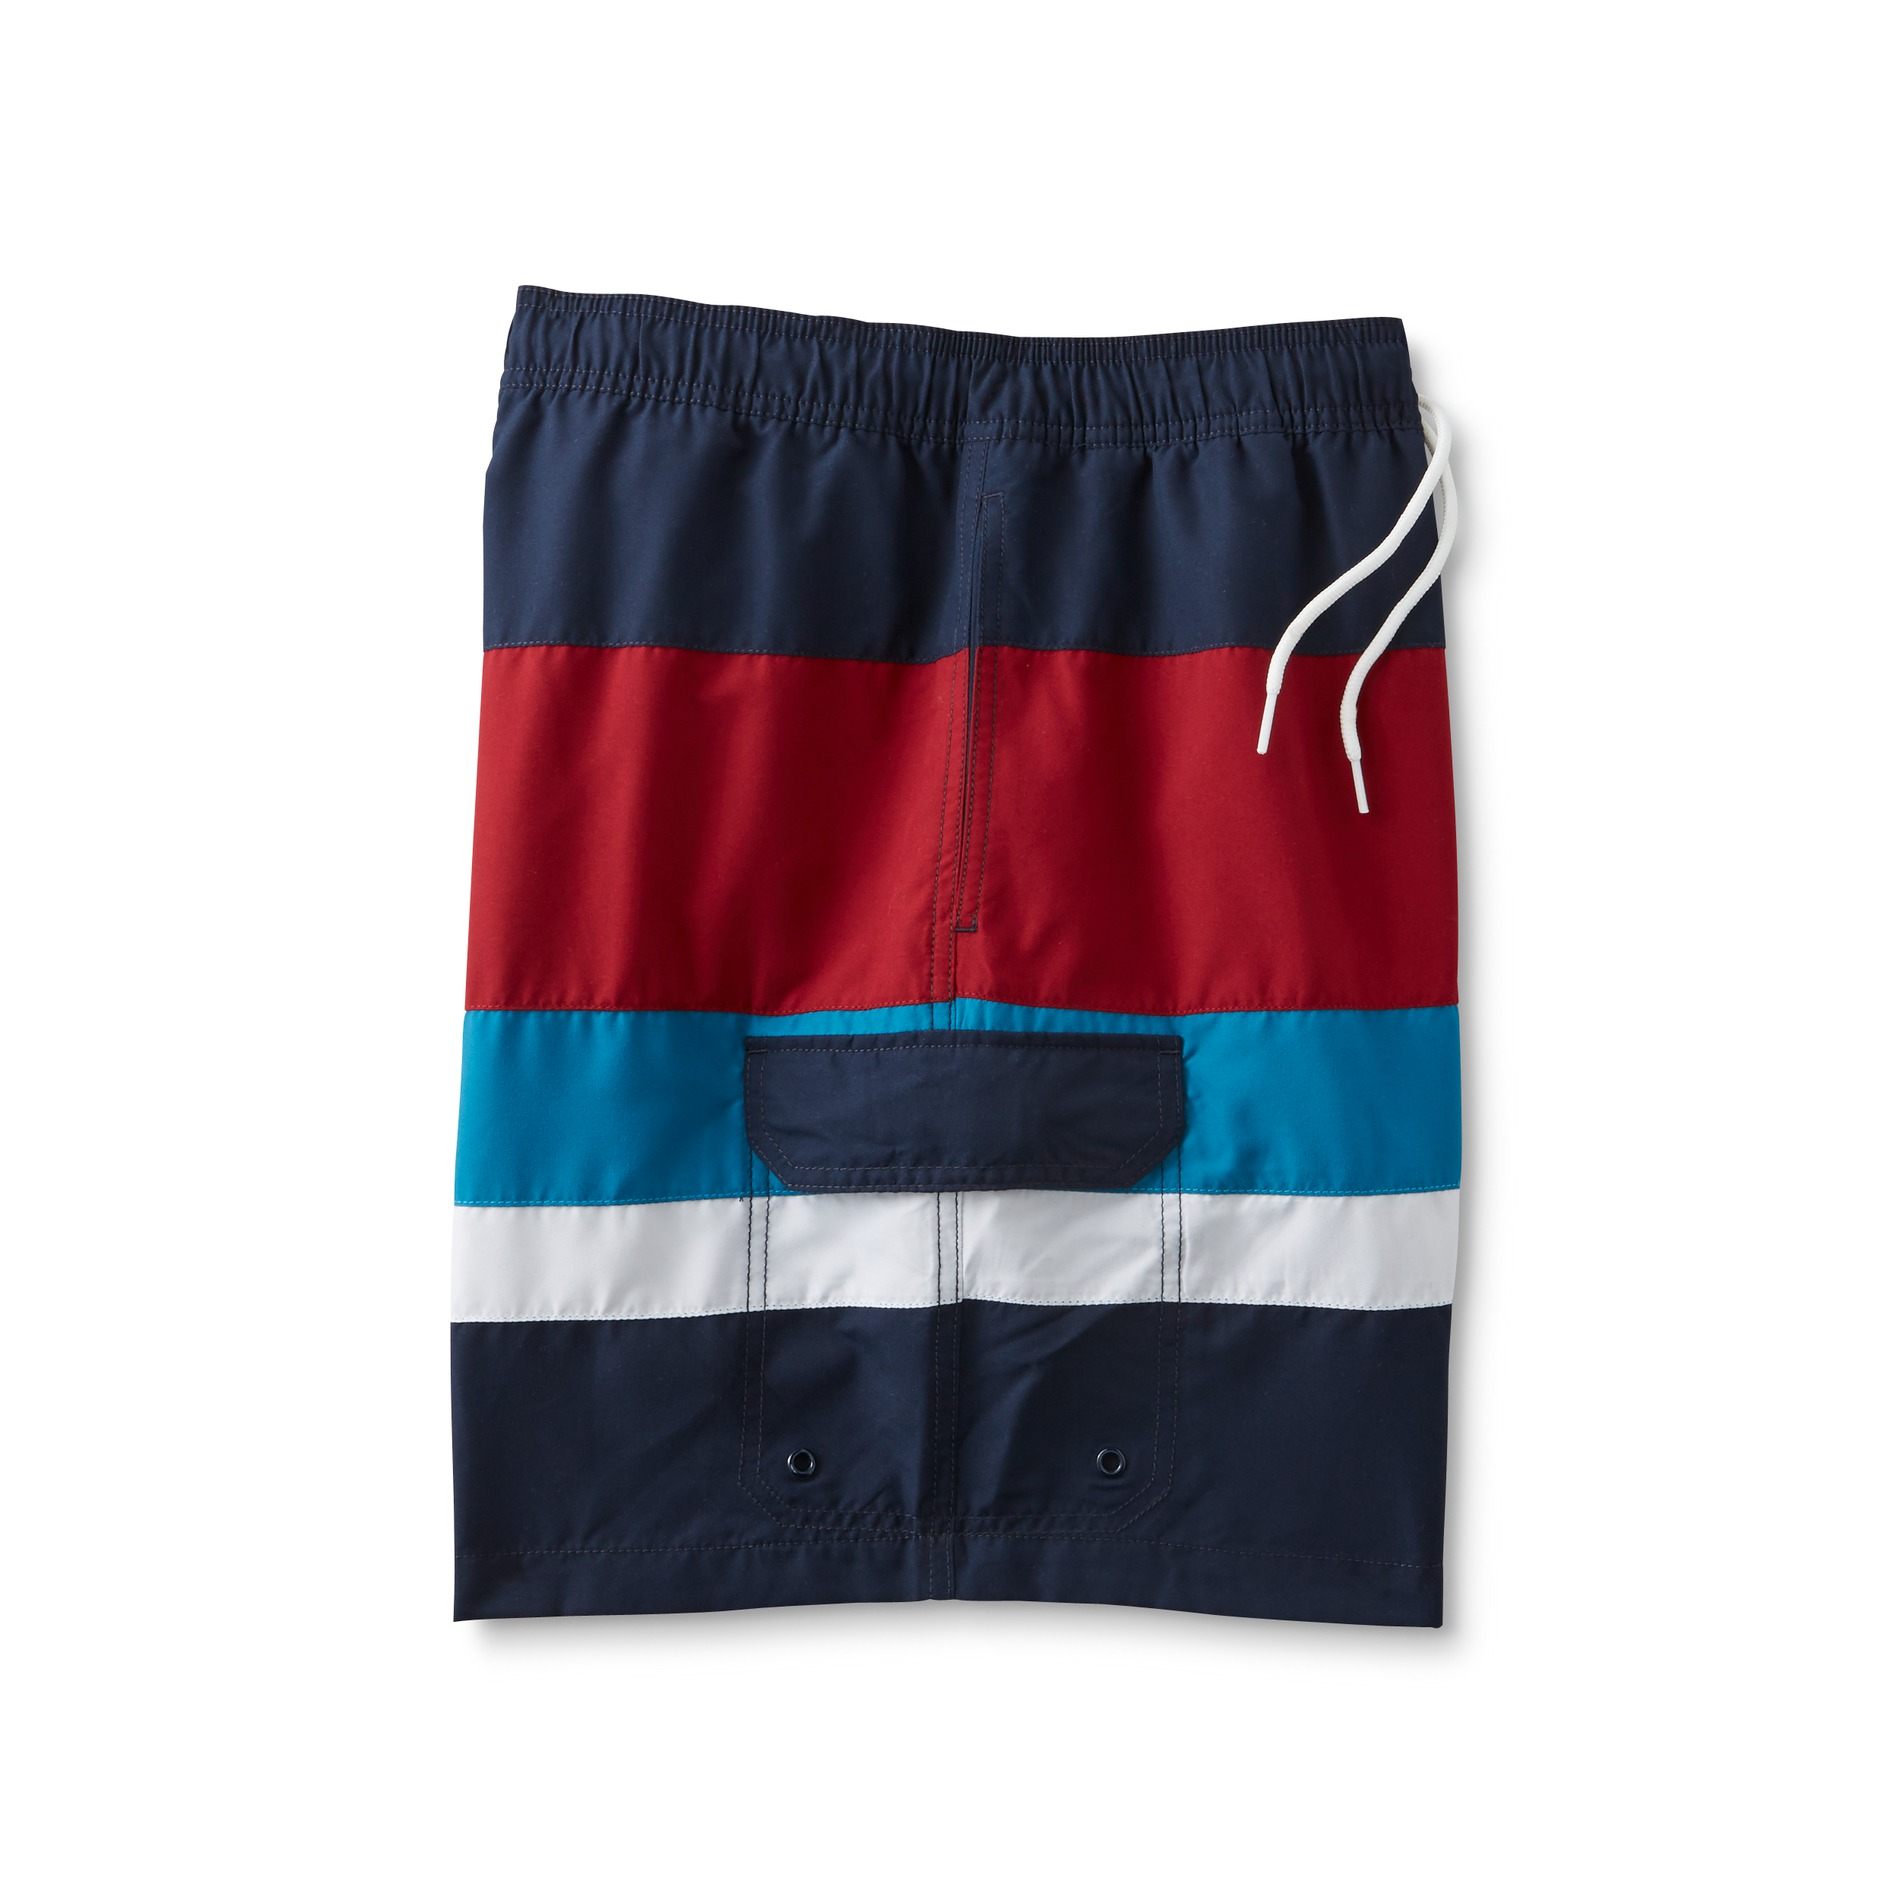 Islander Men's Swim Boardshorts - Striped